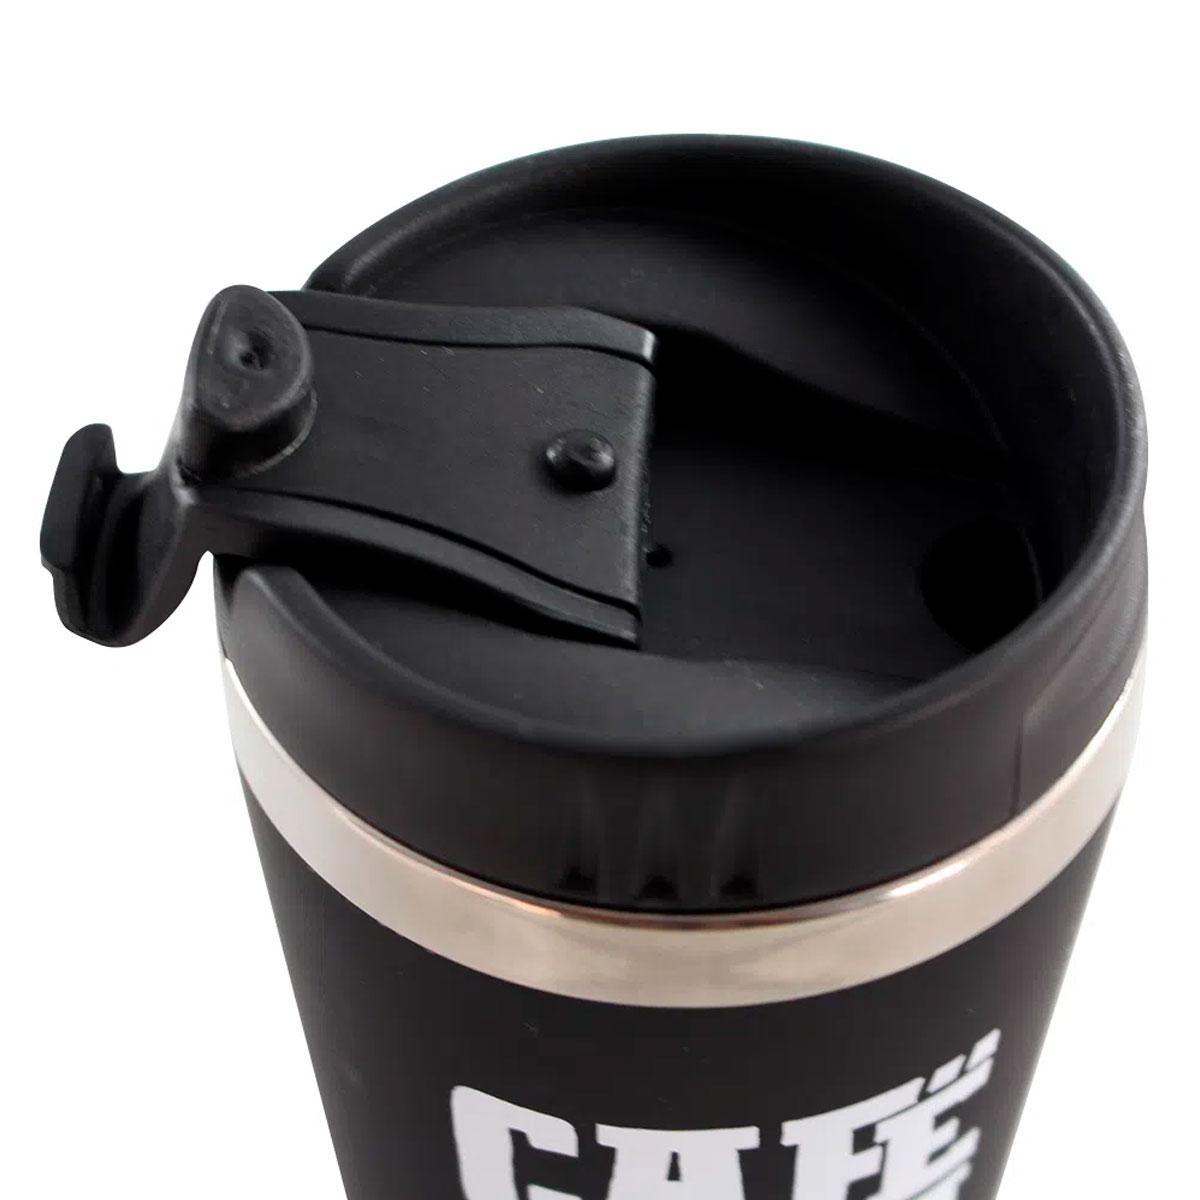 Copo Térmico Emborrachado Café Torna Tudo Possível FBA